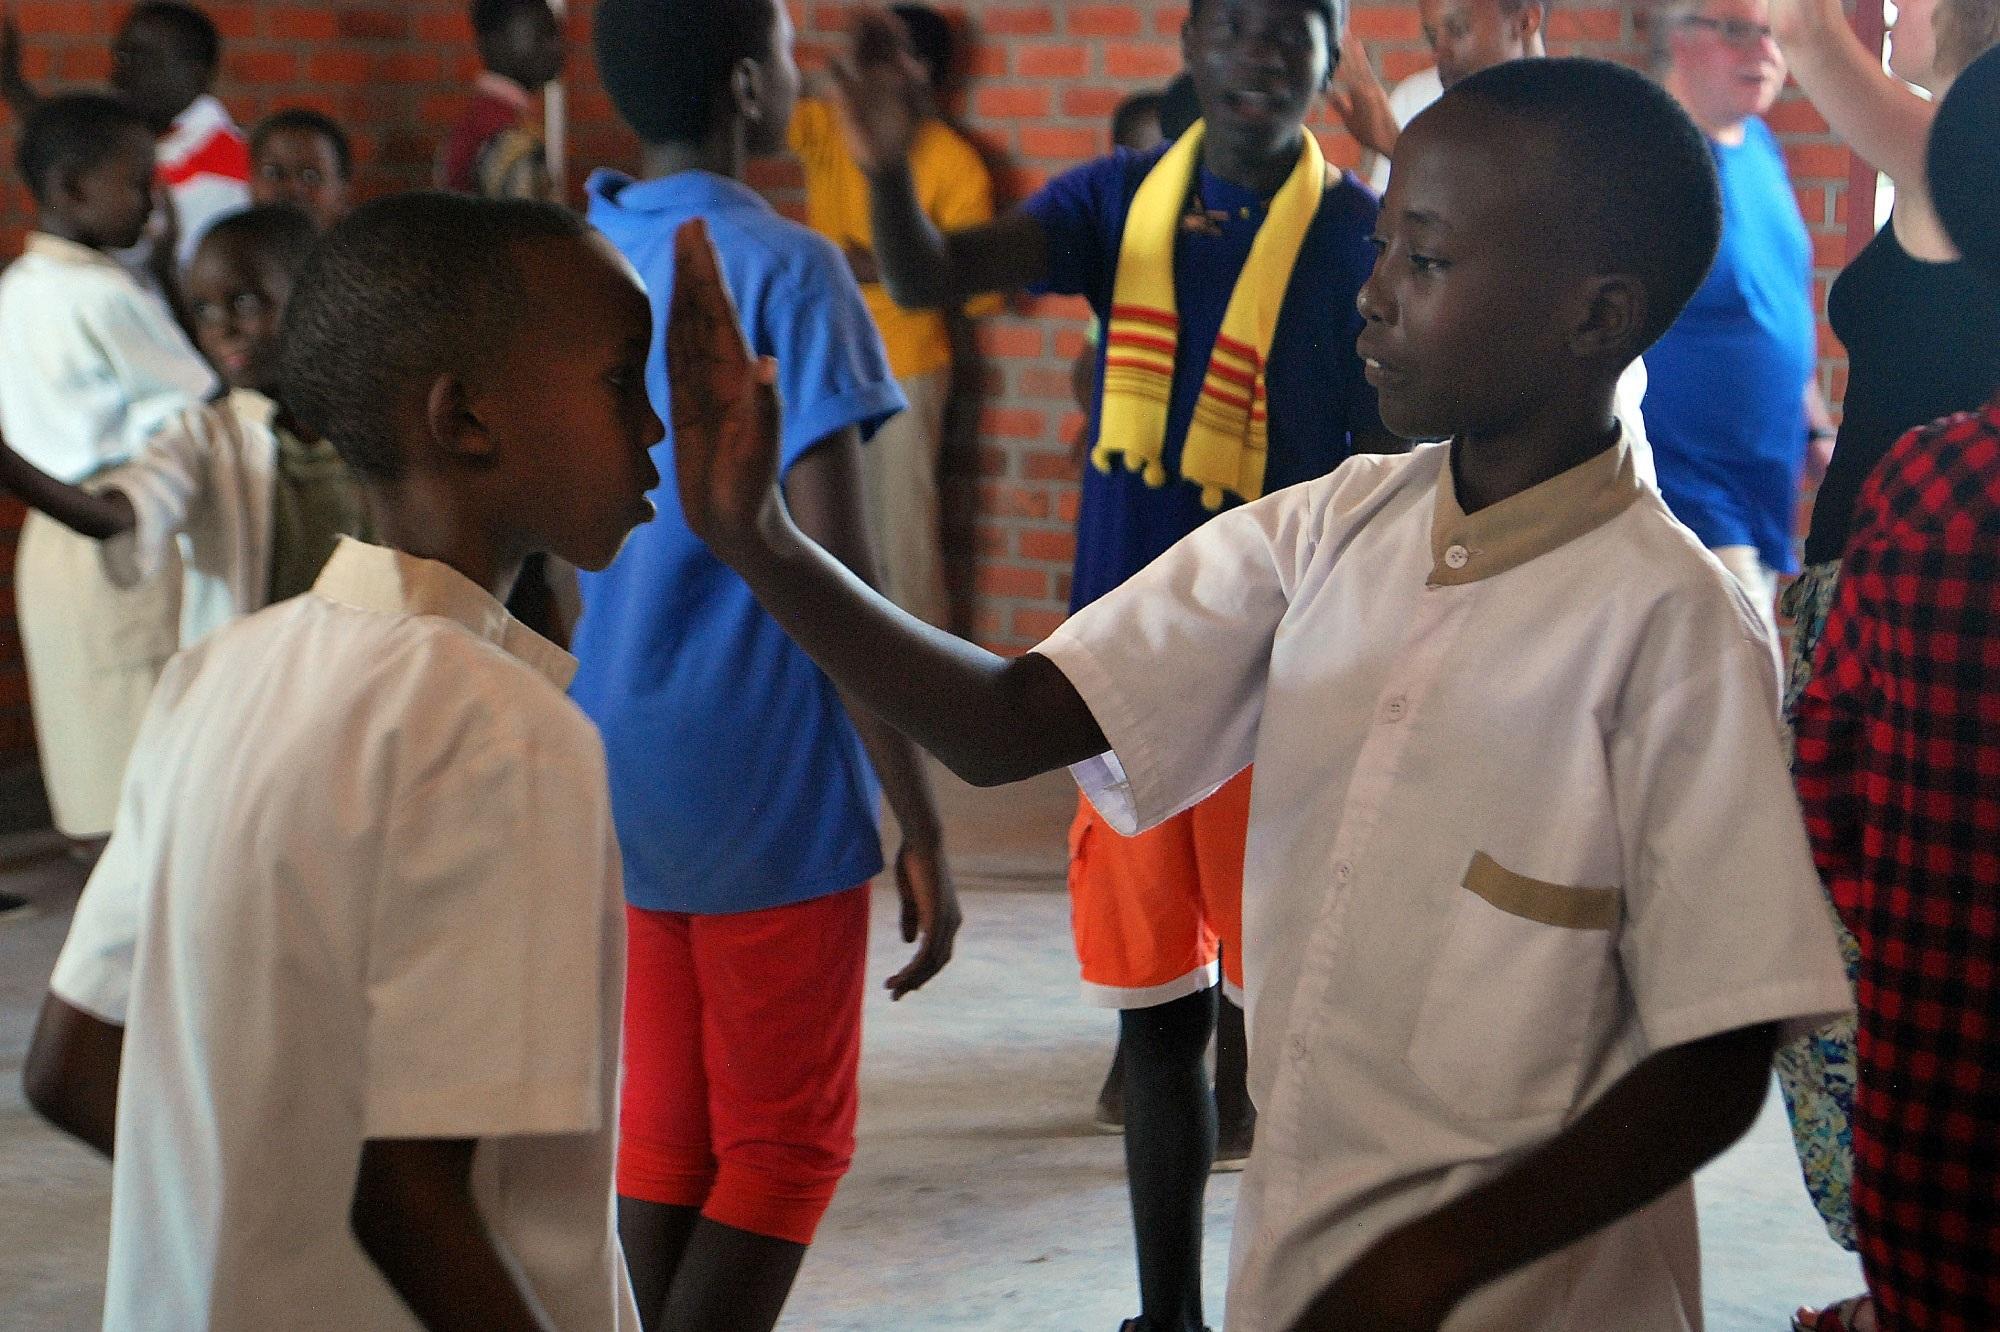 Workshop-Comédie-Humaine-JUN-2017-Bujumbura-c-Johannes-Nix-12